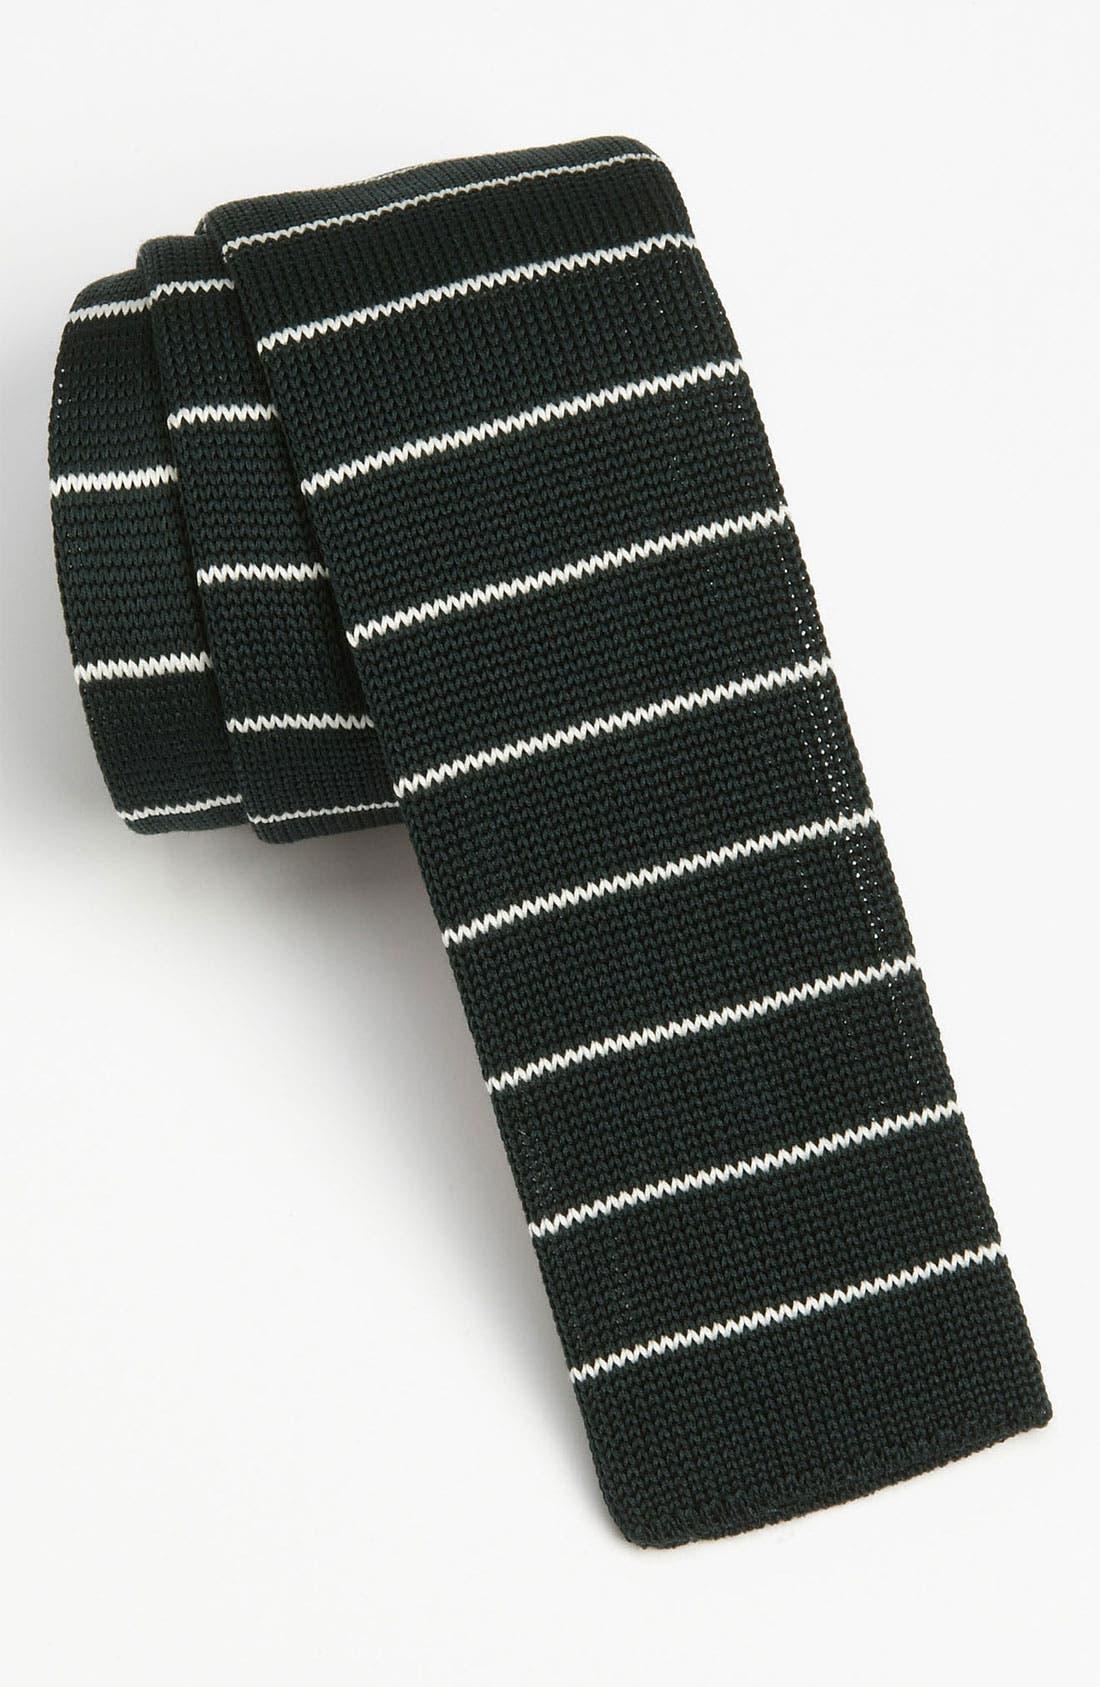 BOSS, HUGO BOSS Cotton Knit Tie, Main thumbnail 1, color, 301